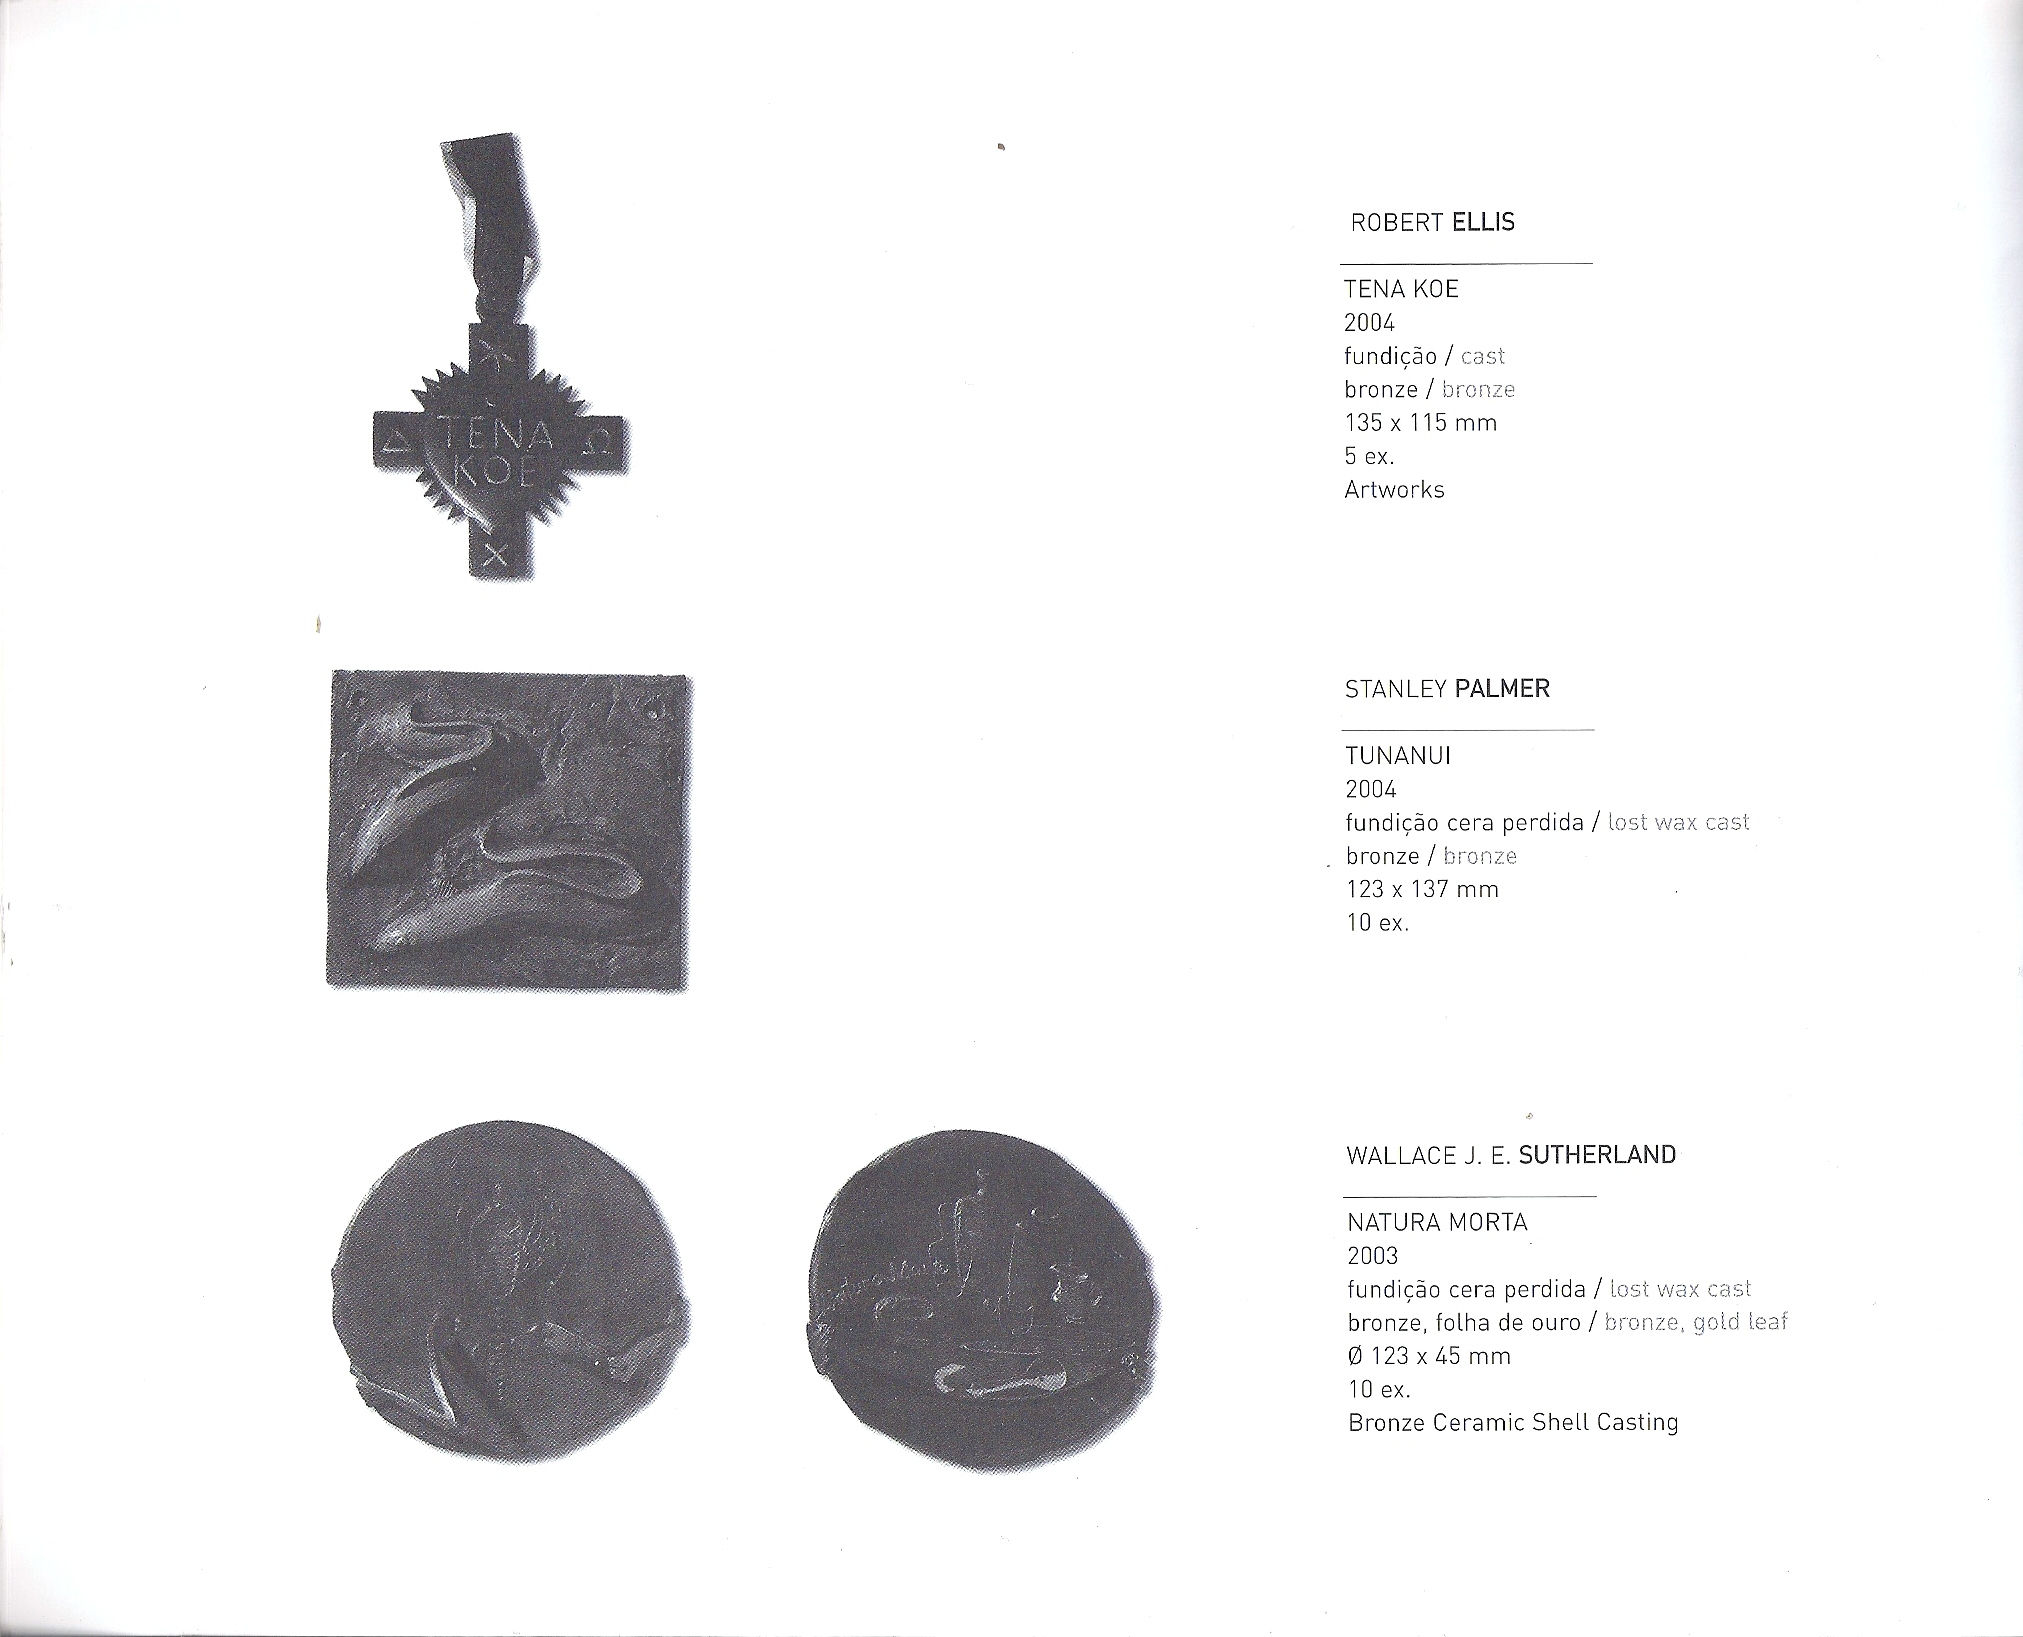 Medal art new zealand 2004 xxix seixal fidem xxix 2004 page 370 03g pooptronica